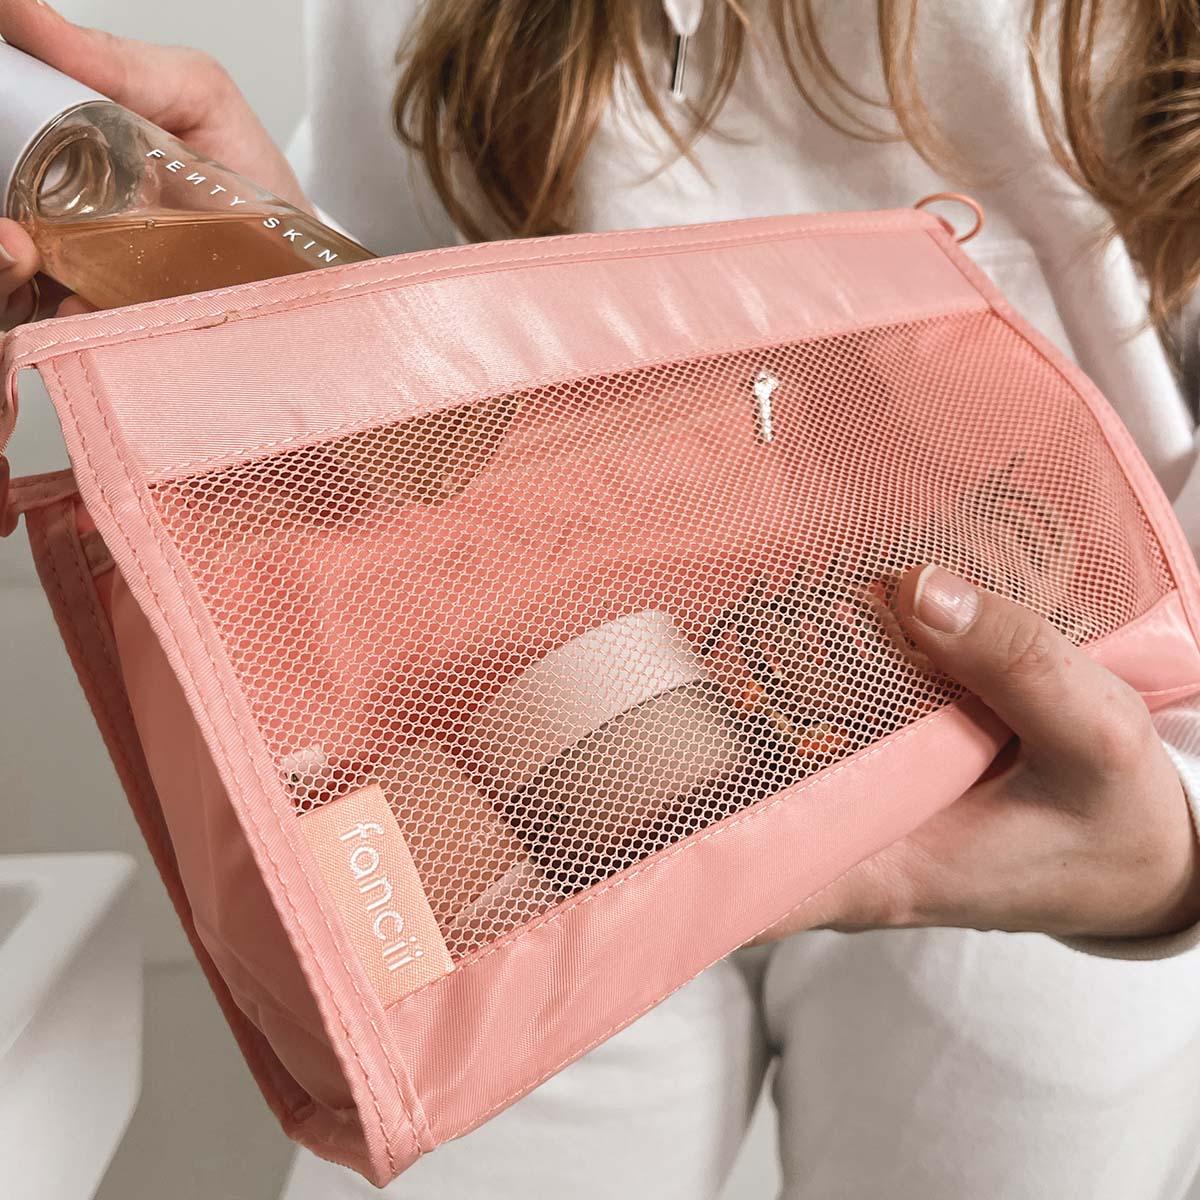 Keep small bathroom toiletries secure in your blush cloe makeup travel bag